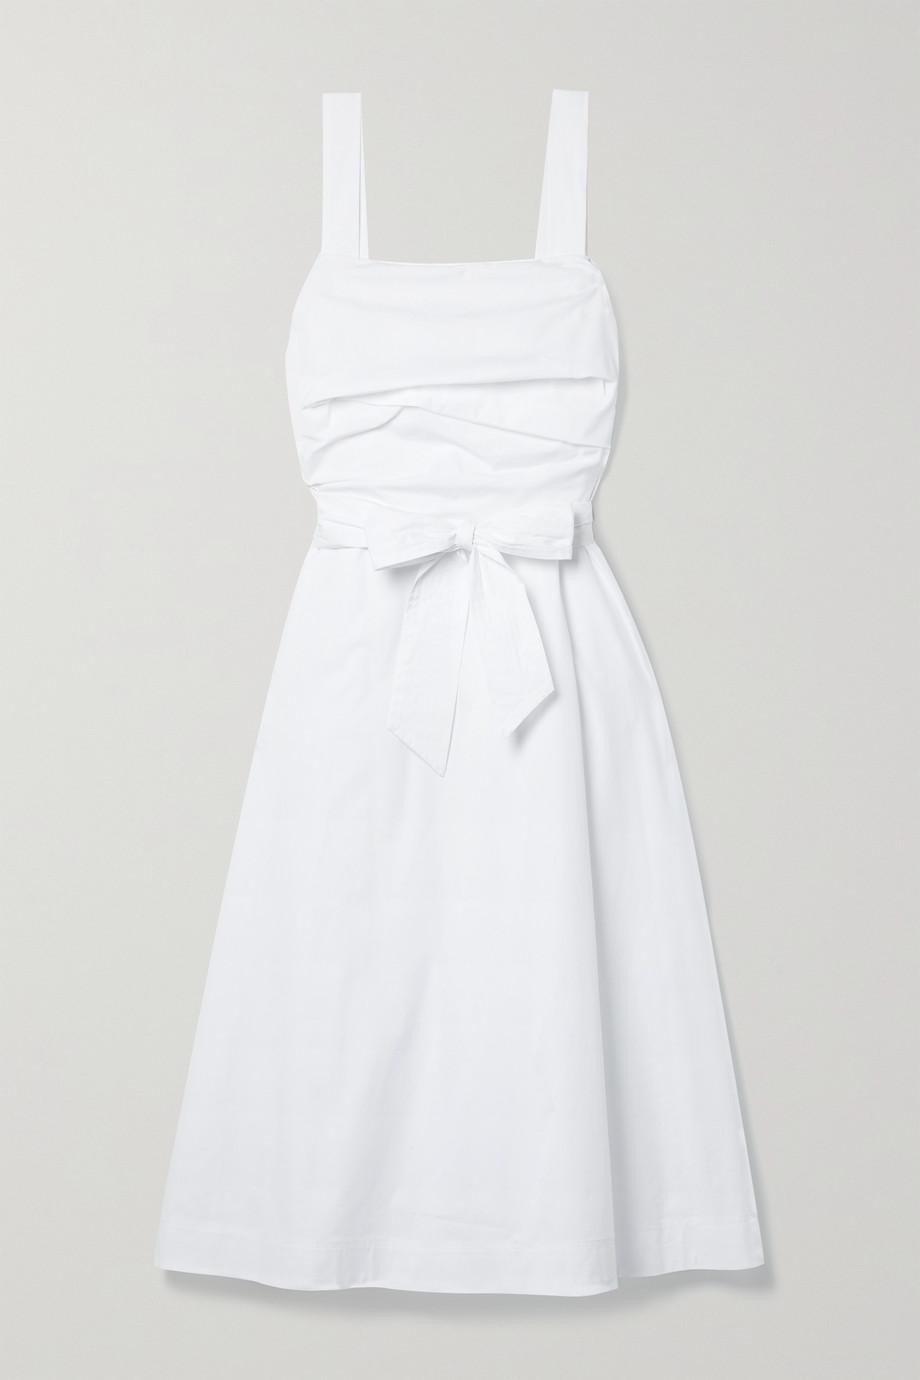 Veronica Beard Positano belted ruched cotton-blend poplin midi dress